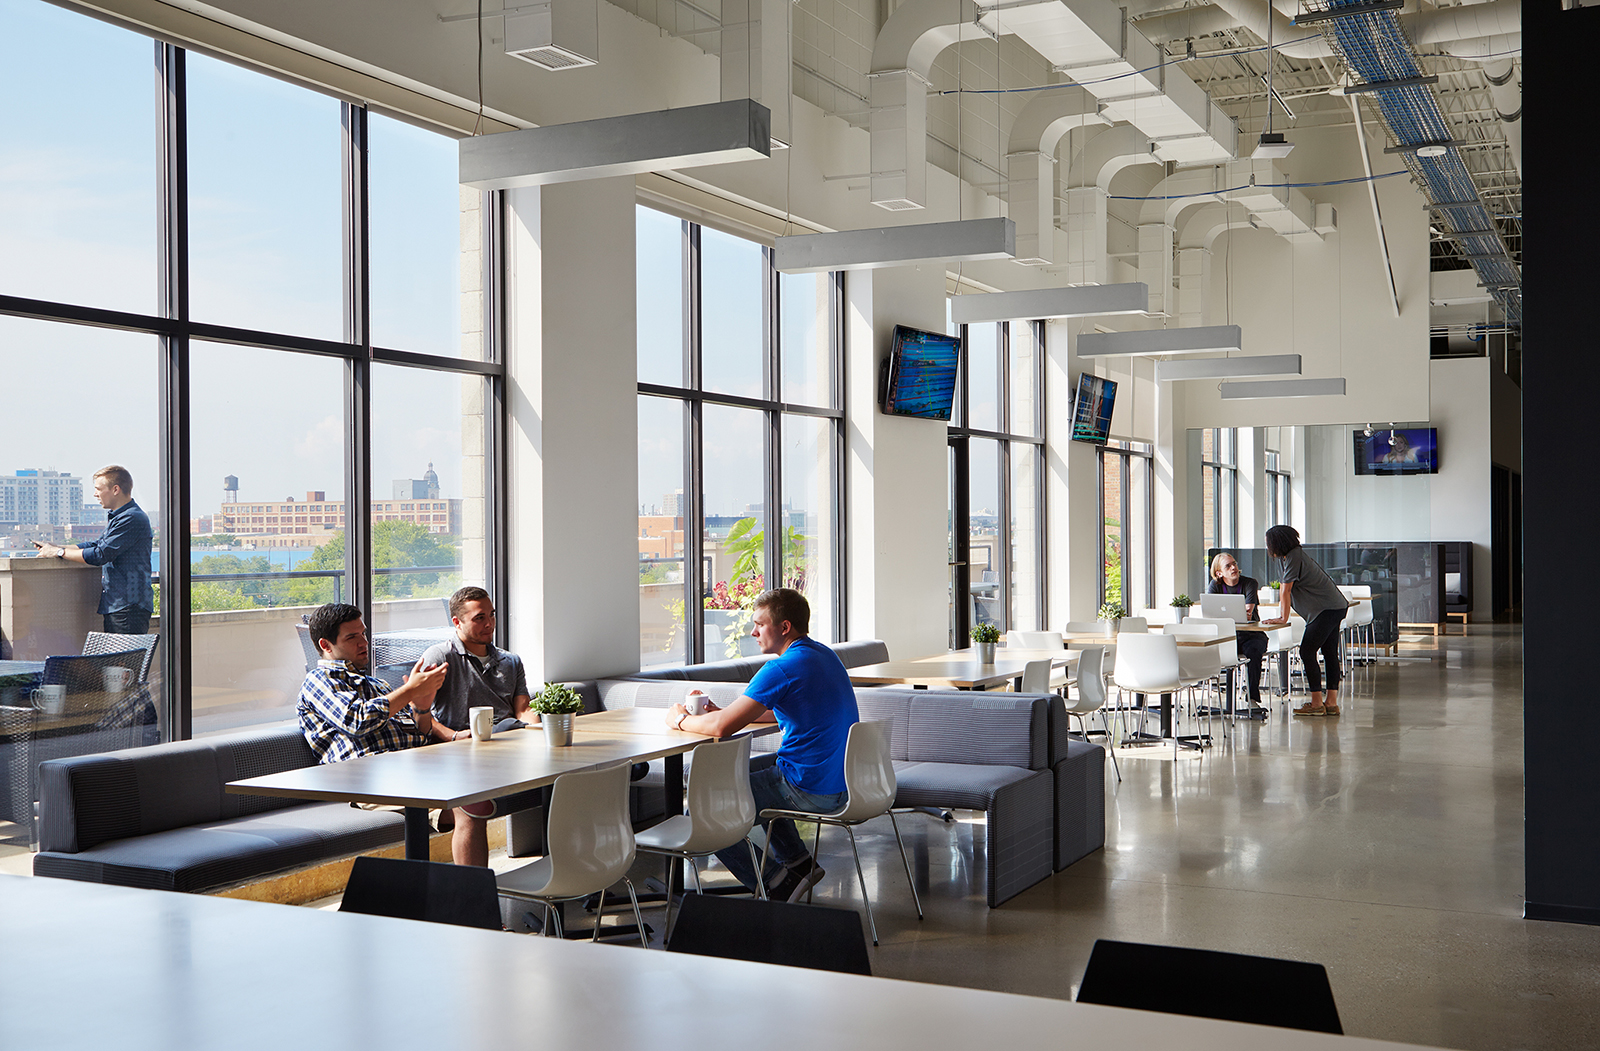 A look inside ncsa s new sleek chicago office officelovin 39 - Interior design firms chicago ...